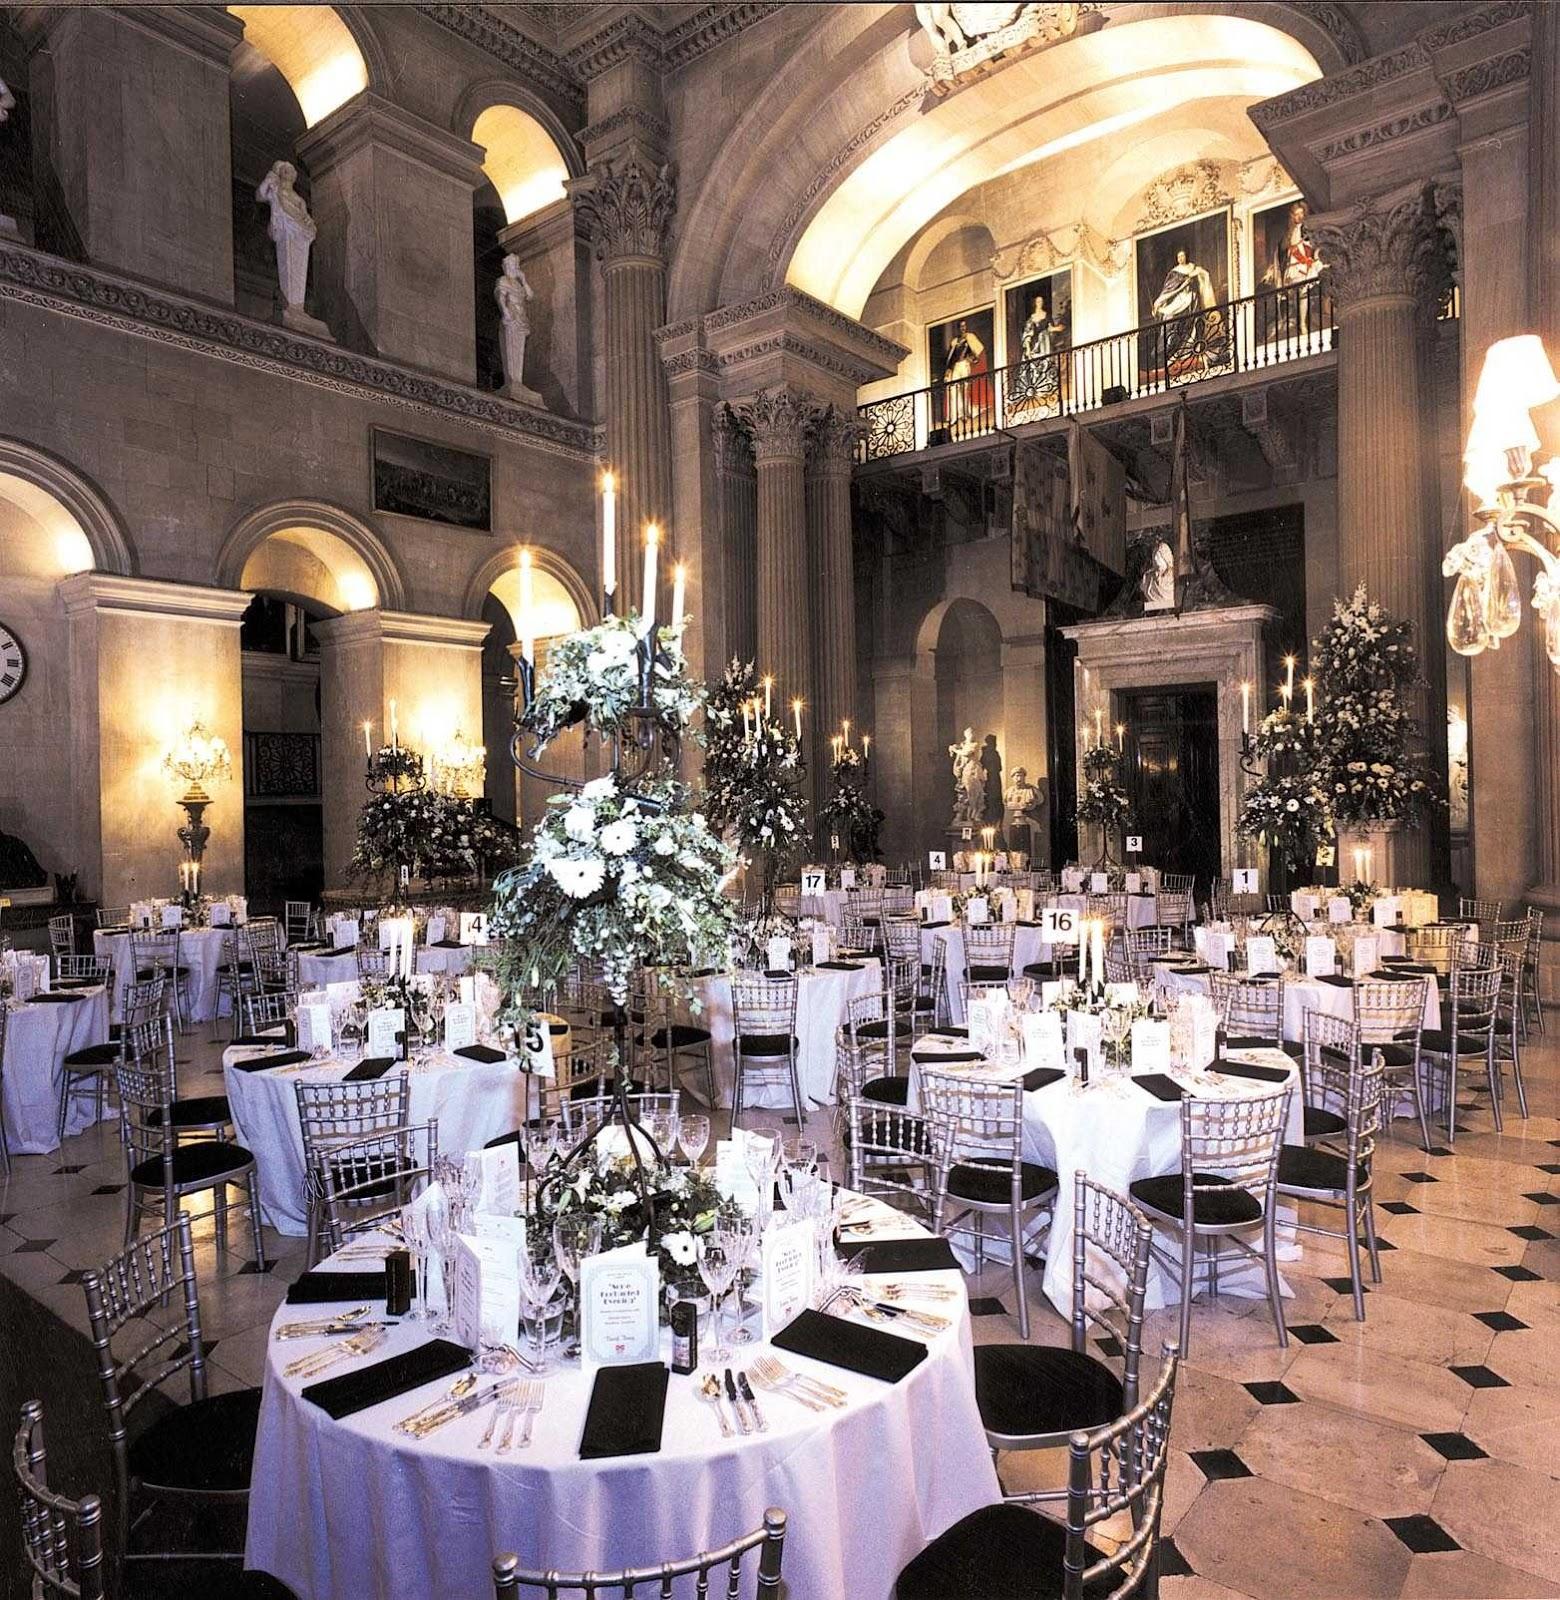 Great Hall, Restaurant din Blenheim Palace